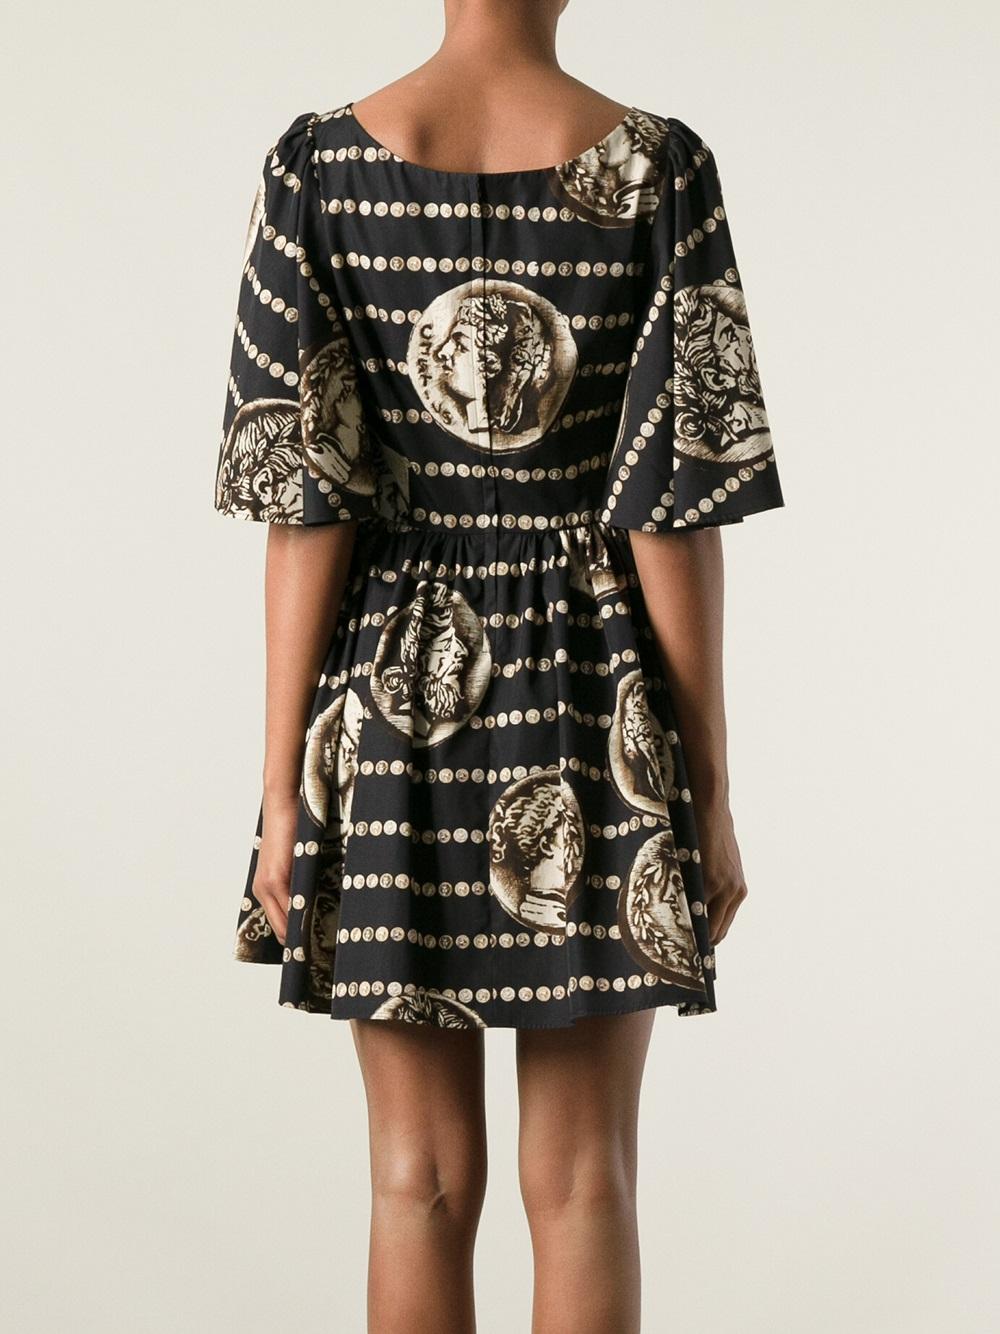 Dolce Amp Gabbana Roman Coin Print Dress In Black Lyst